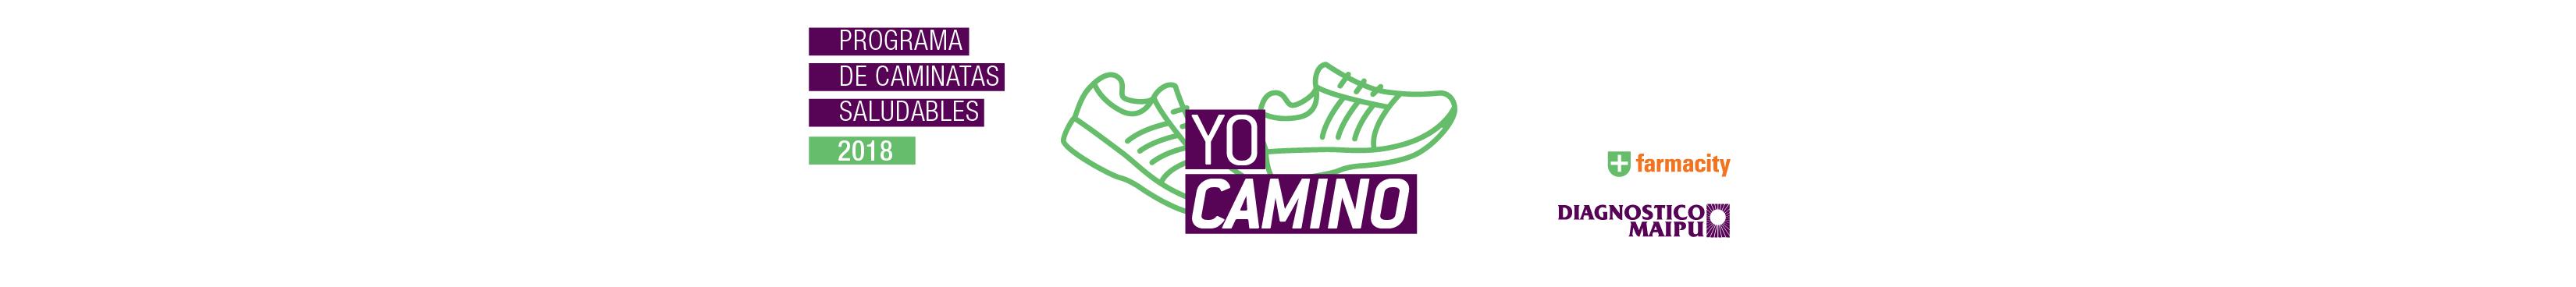 Banner-Web_caminatas